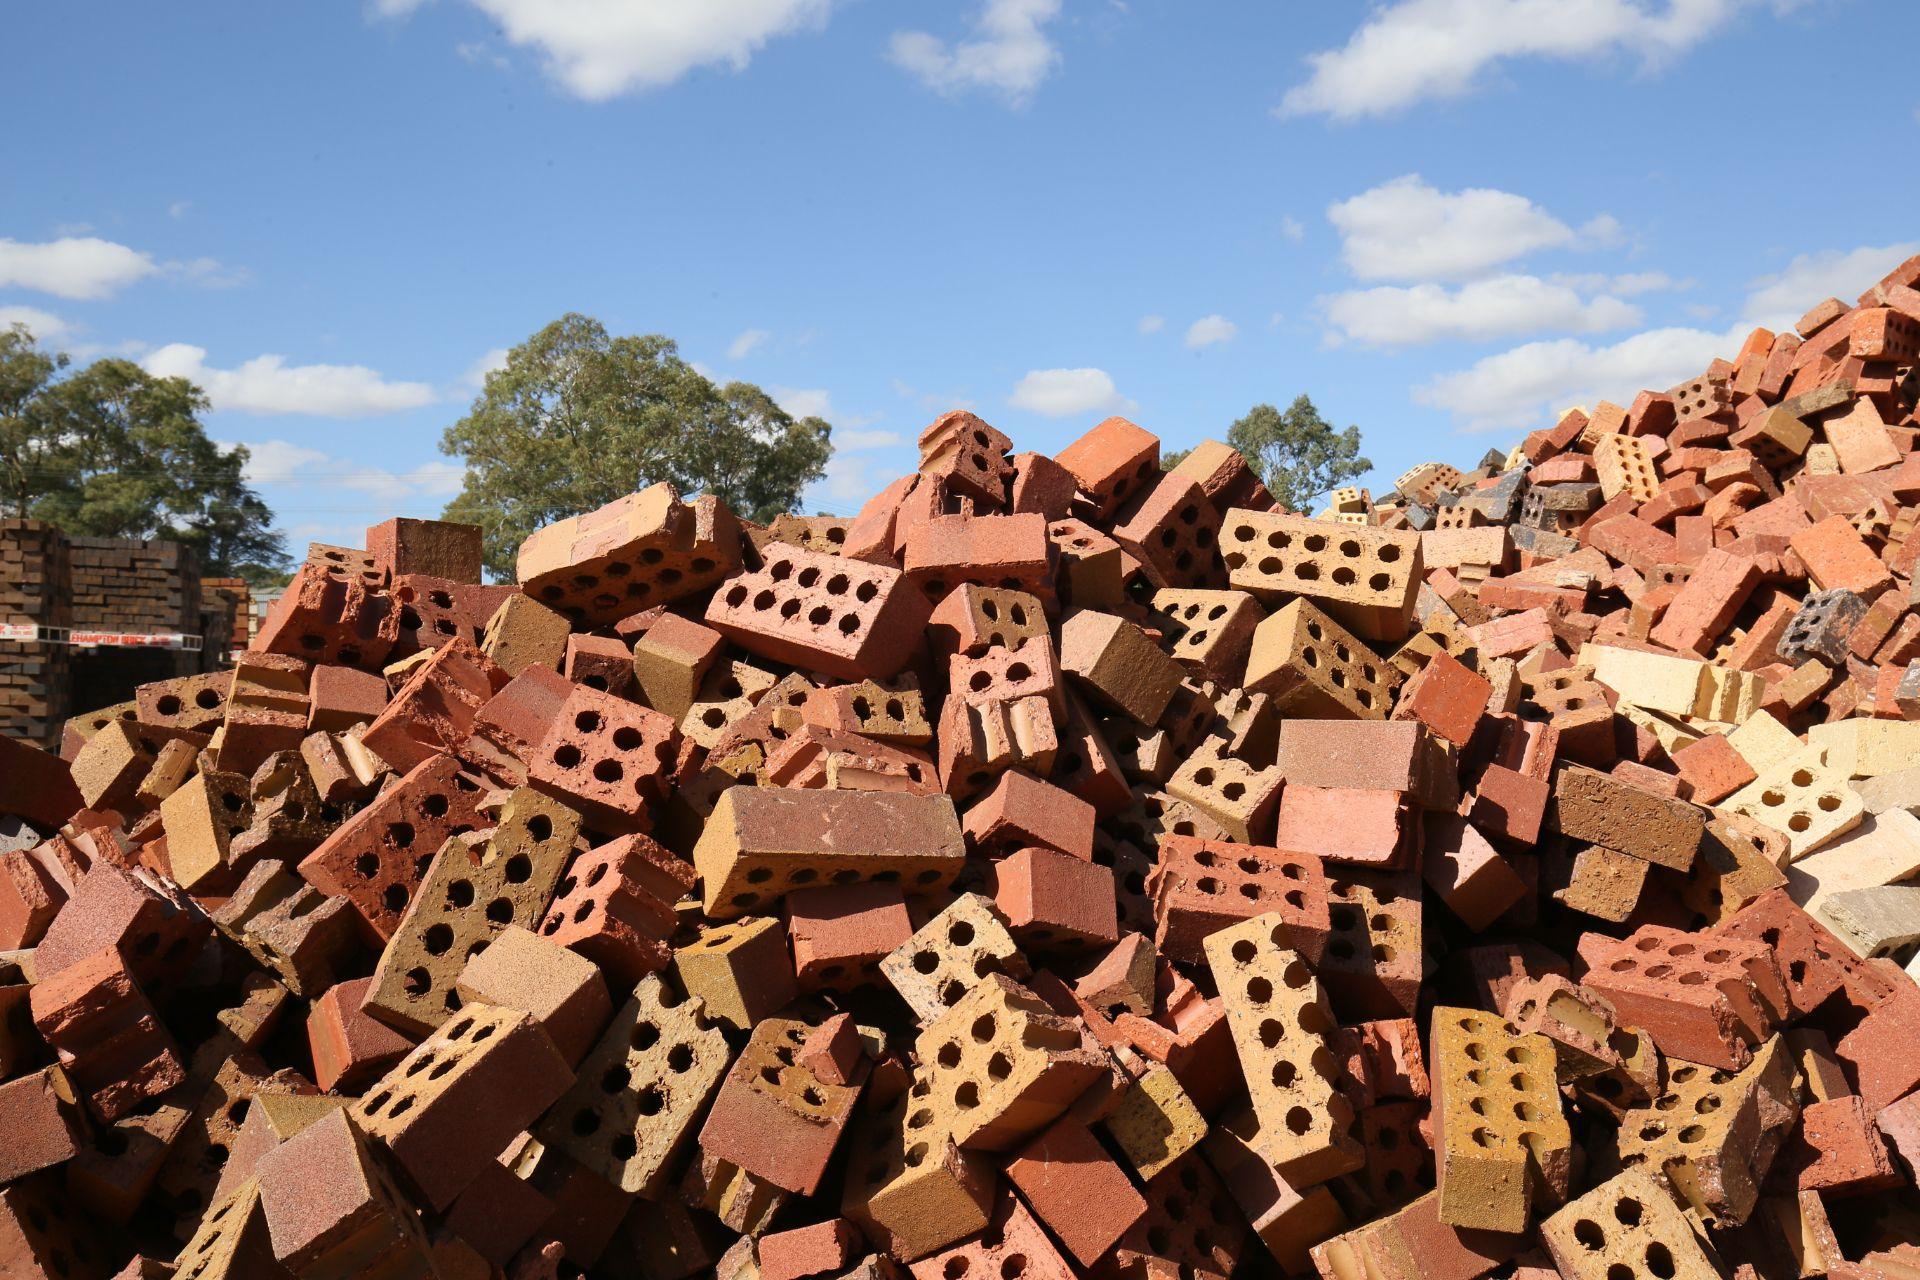 pexels-littlehampton-bricks-4509112 (1).jpg